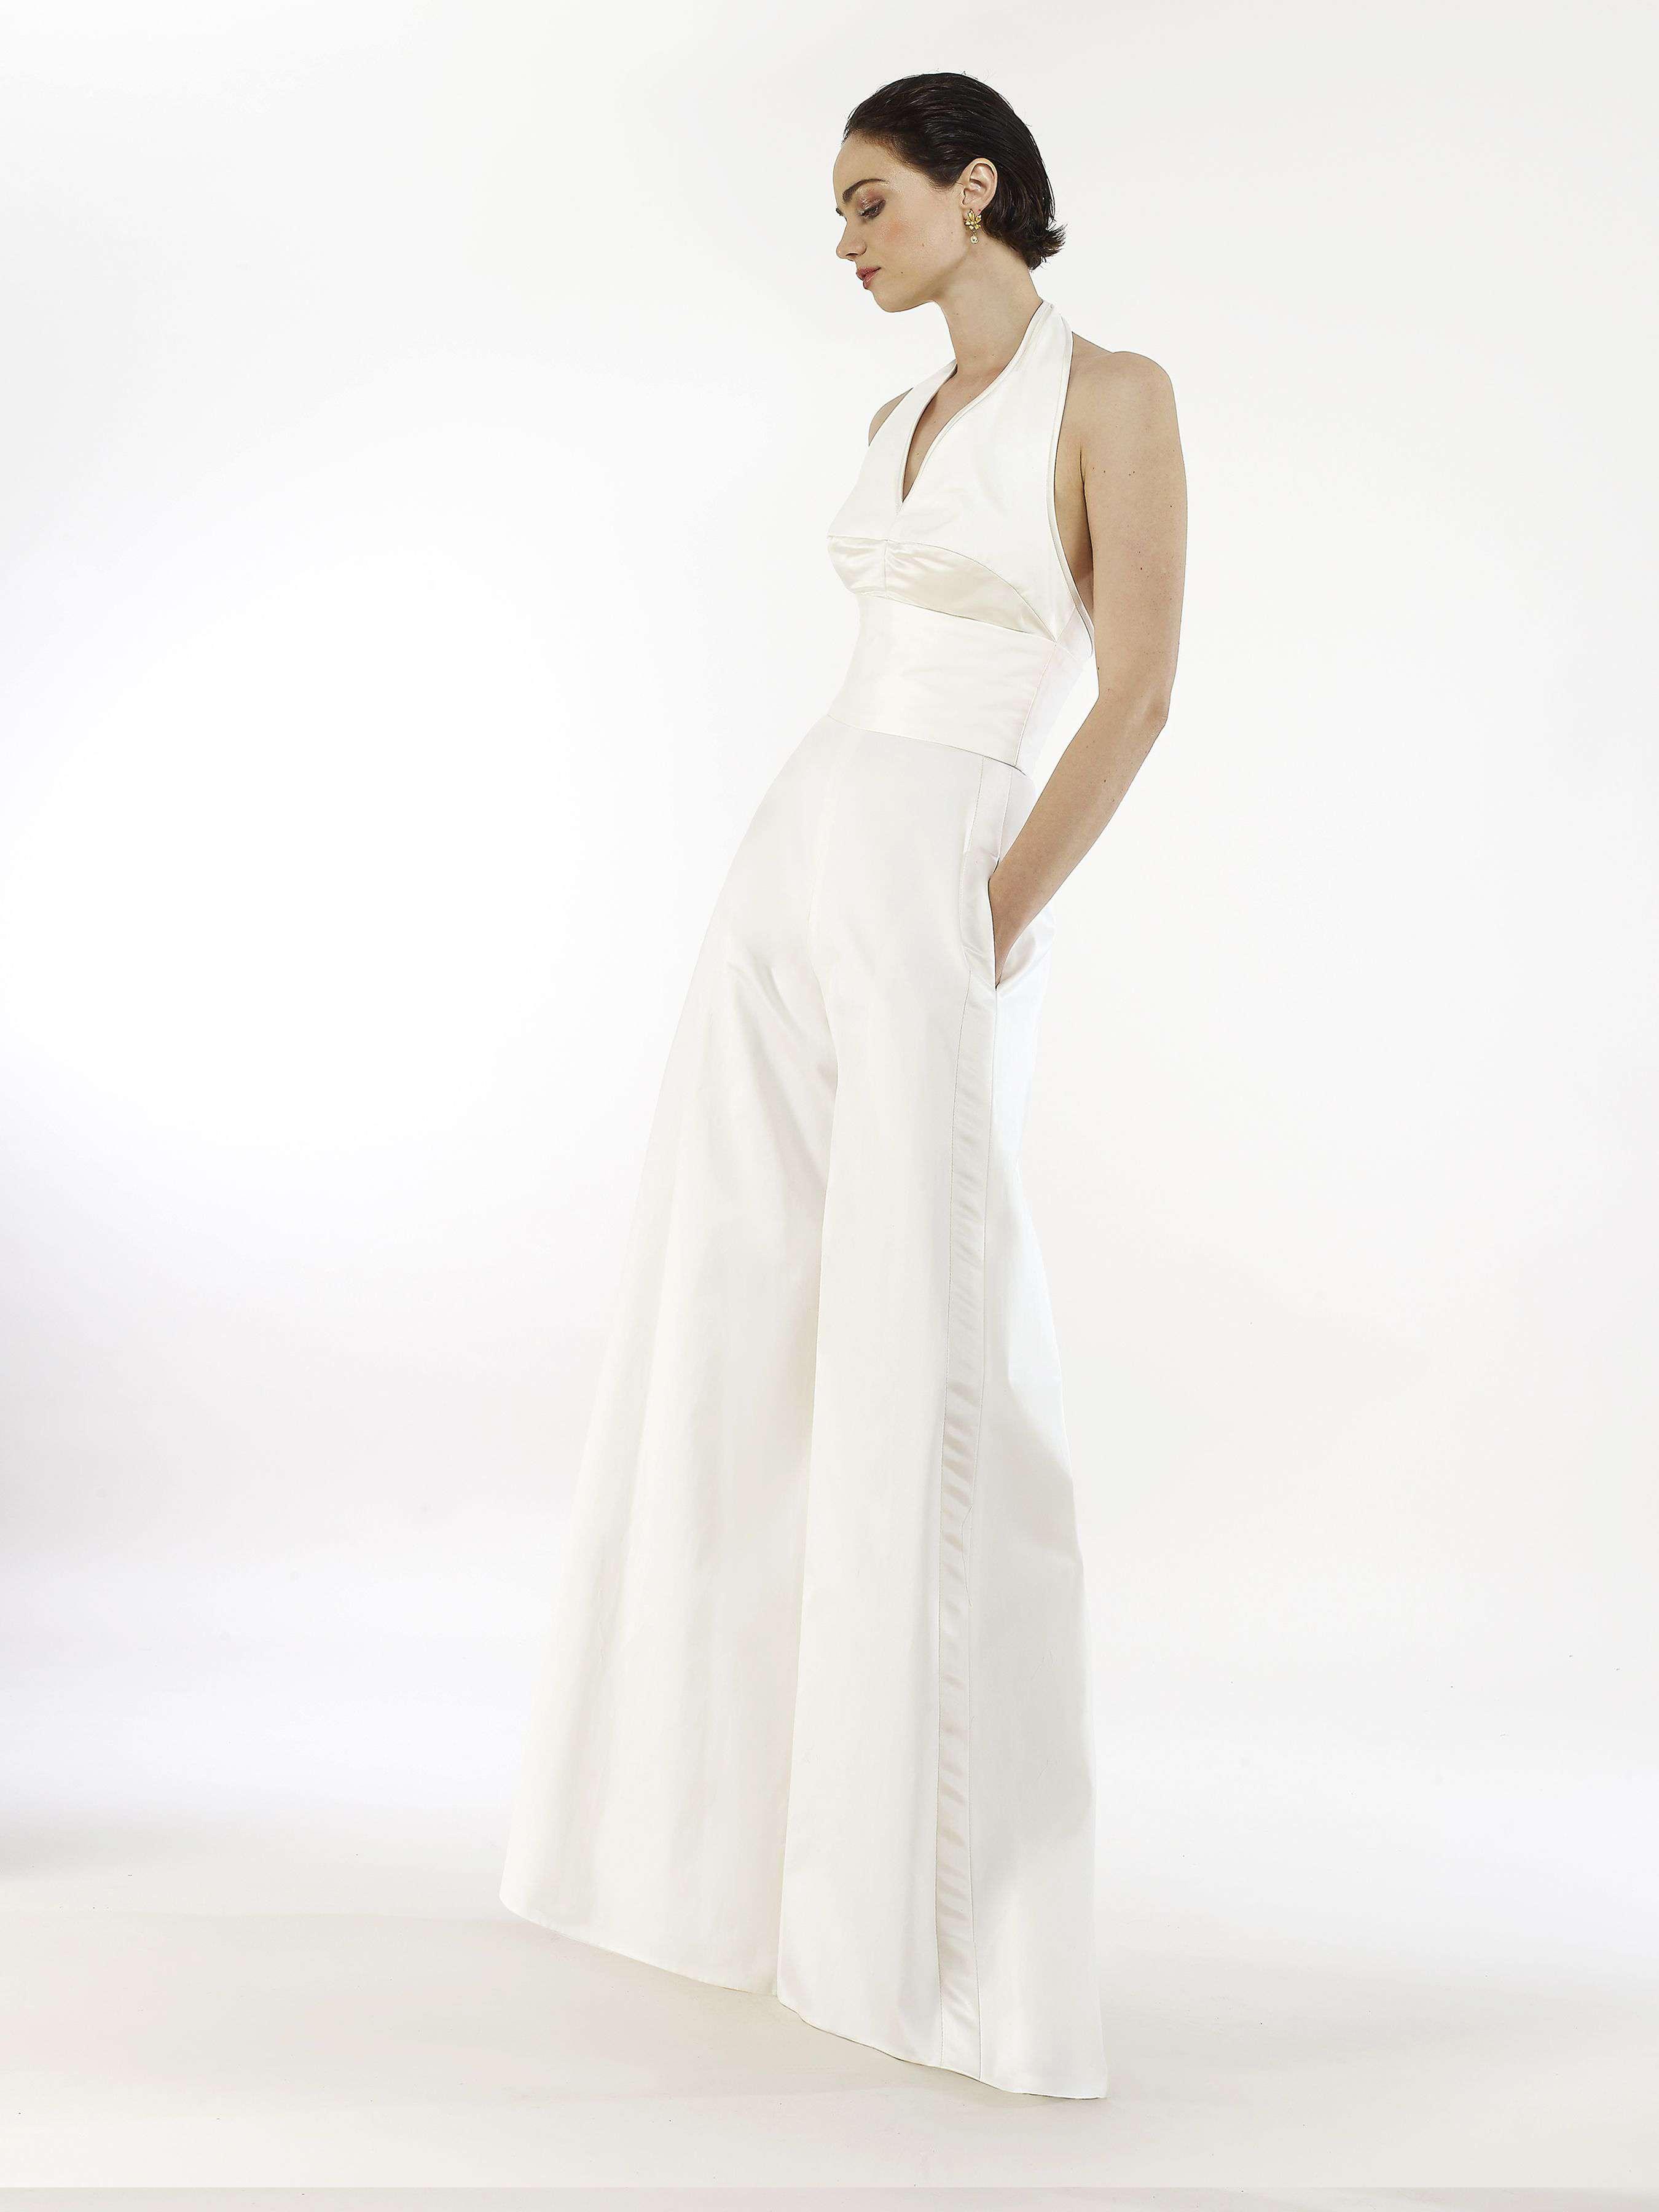 Model in halter-neck bridal jumpsuit with wide-leg pants